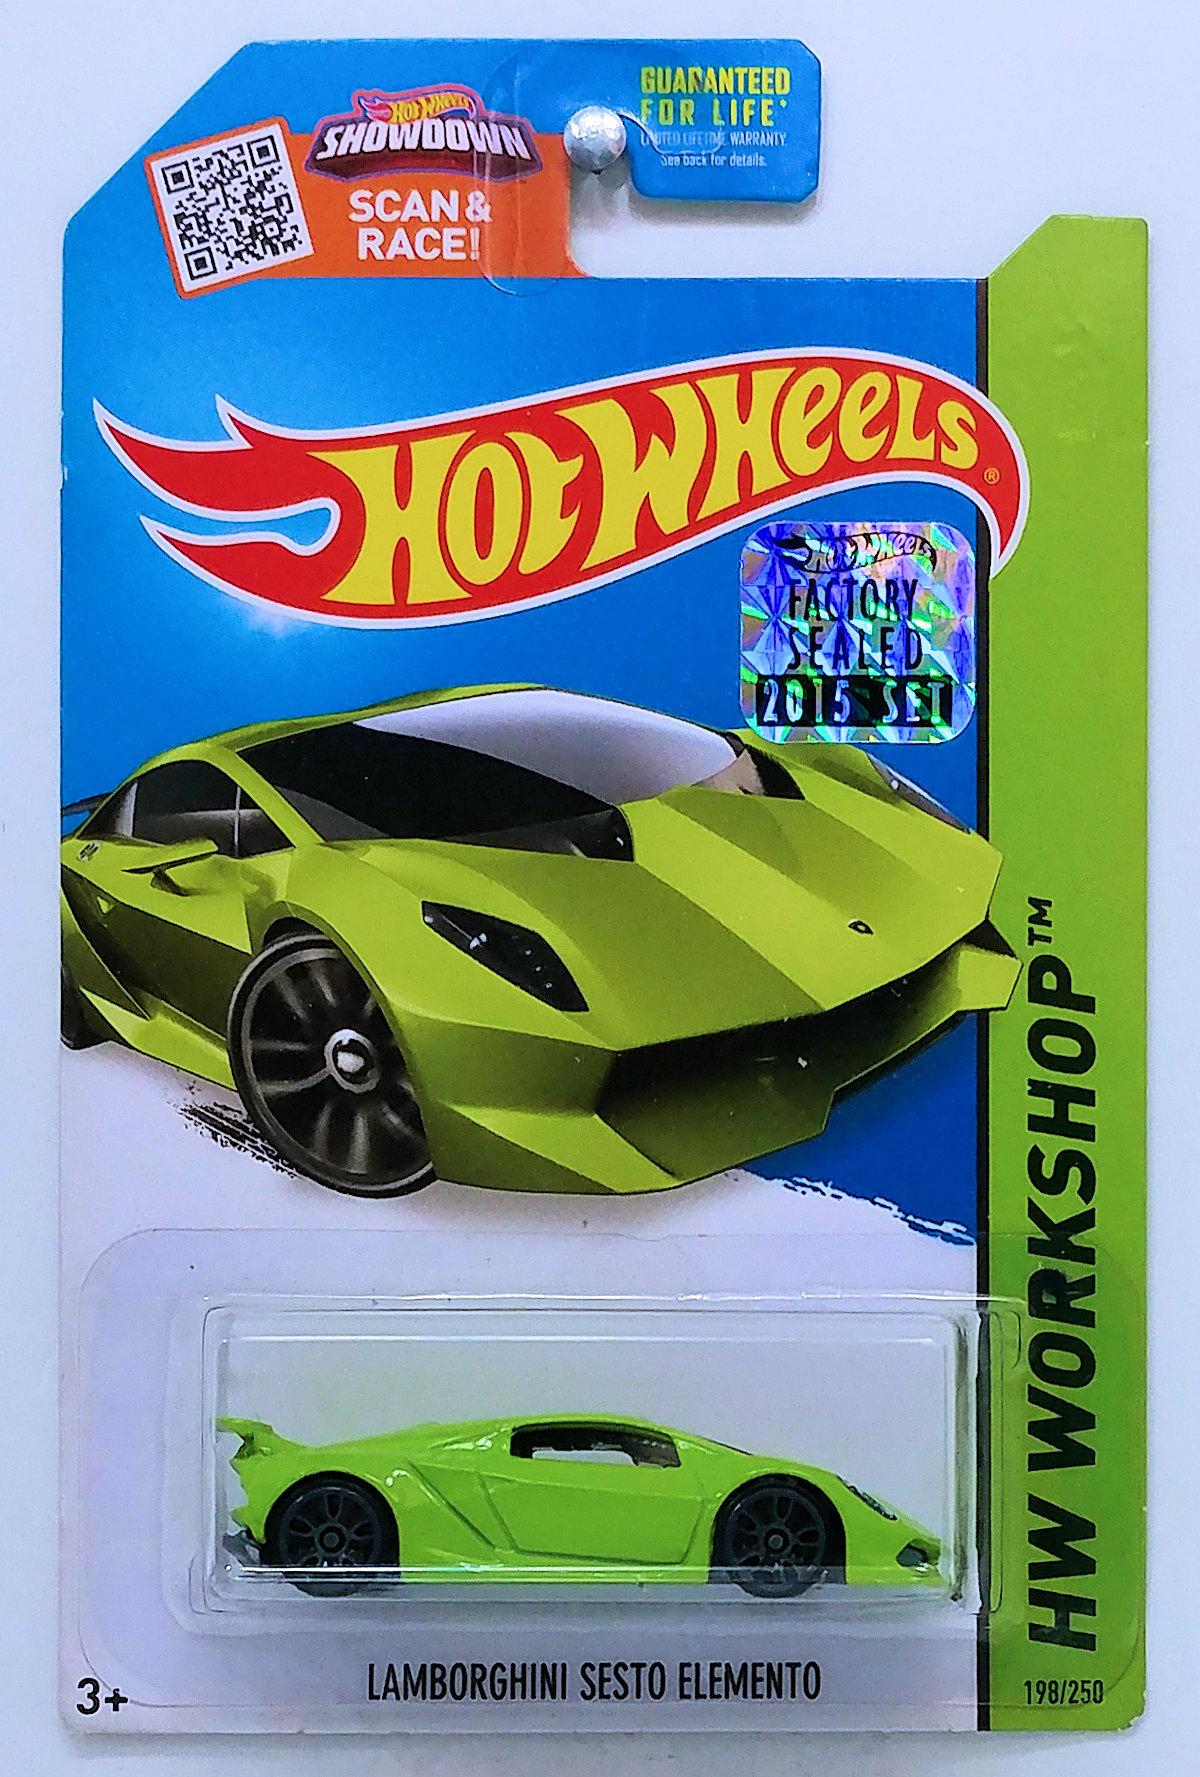 Lamborghini Sesto Elemento The Hobbydb Marketplace